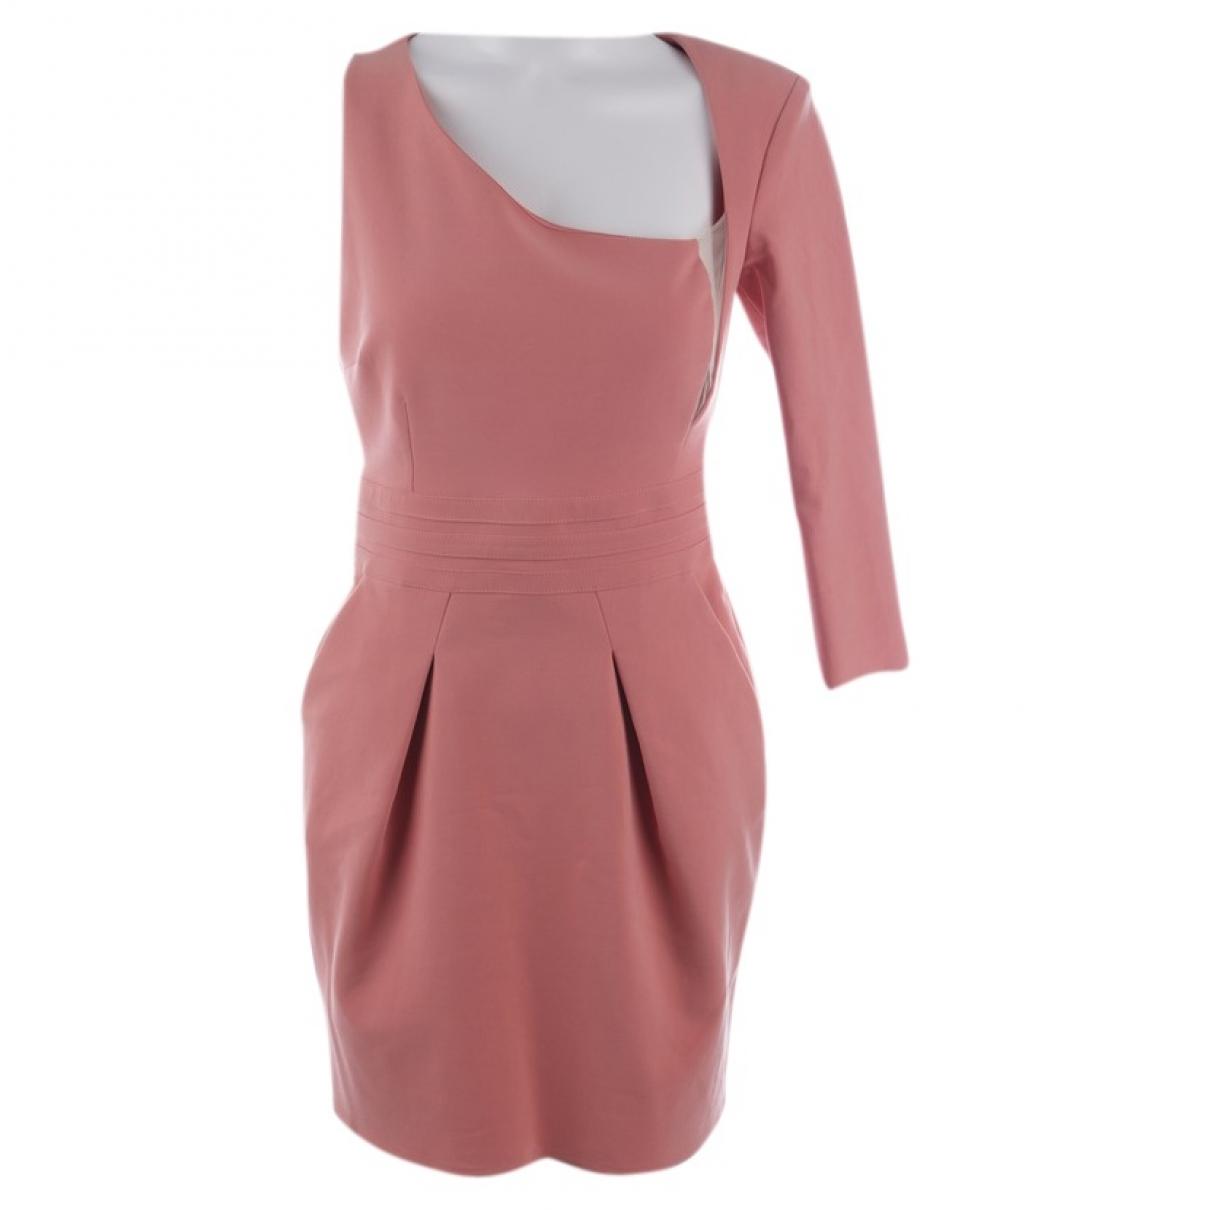 Elisabetta Franchi \N Orange Cotton dress for Women 36 FR